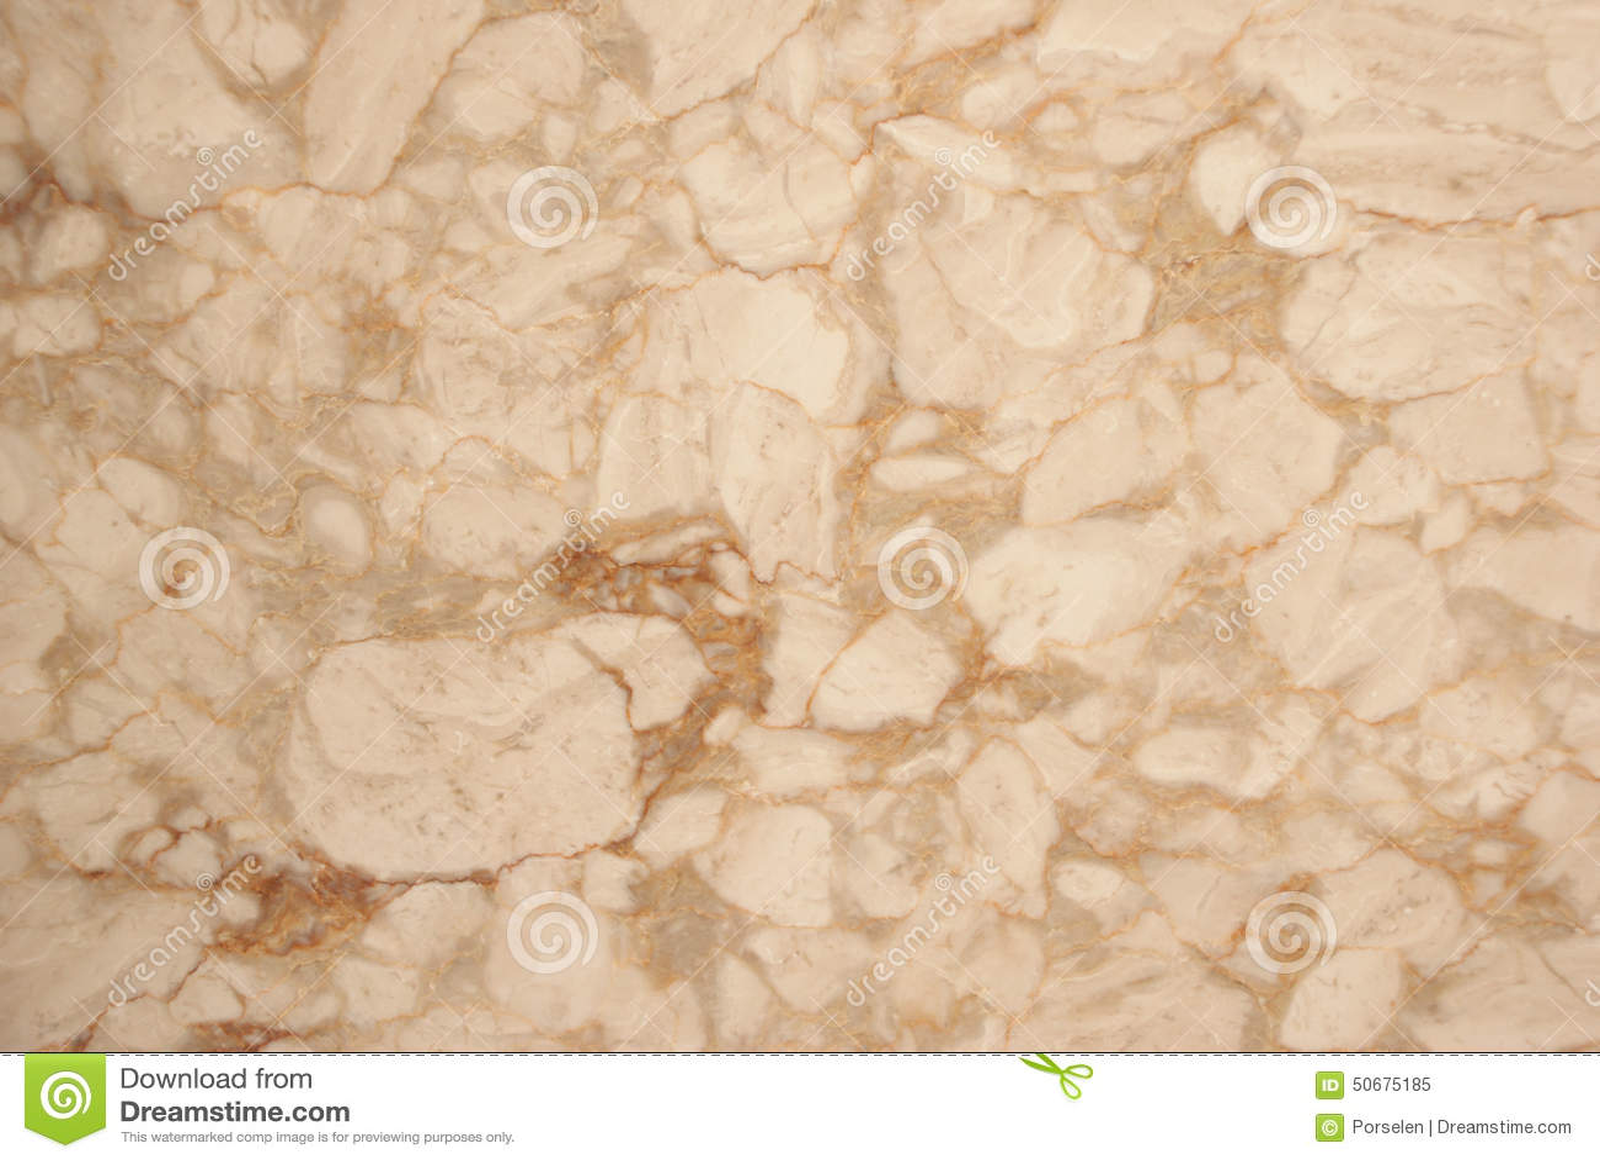 Download 另外大理石 库存图片. 图片 包括有 楼层, 设计, 黑暗, 花岗岩, 墙壁, 大理石, 线路, 瓦片, 抽象 - 50675185